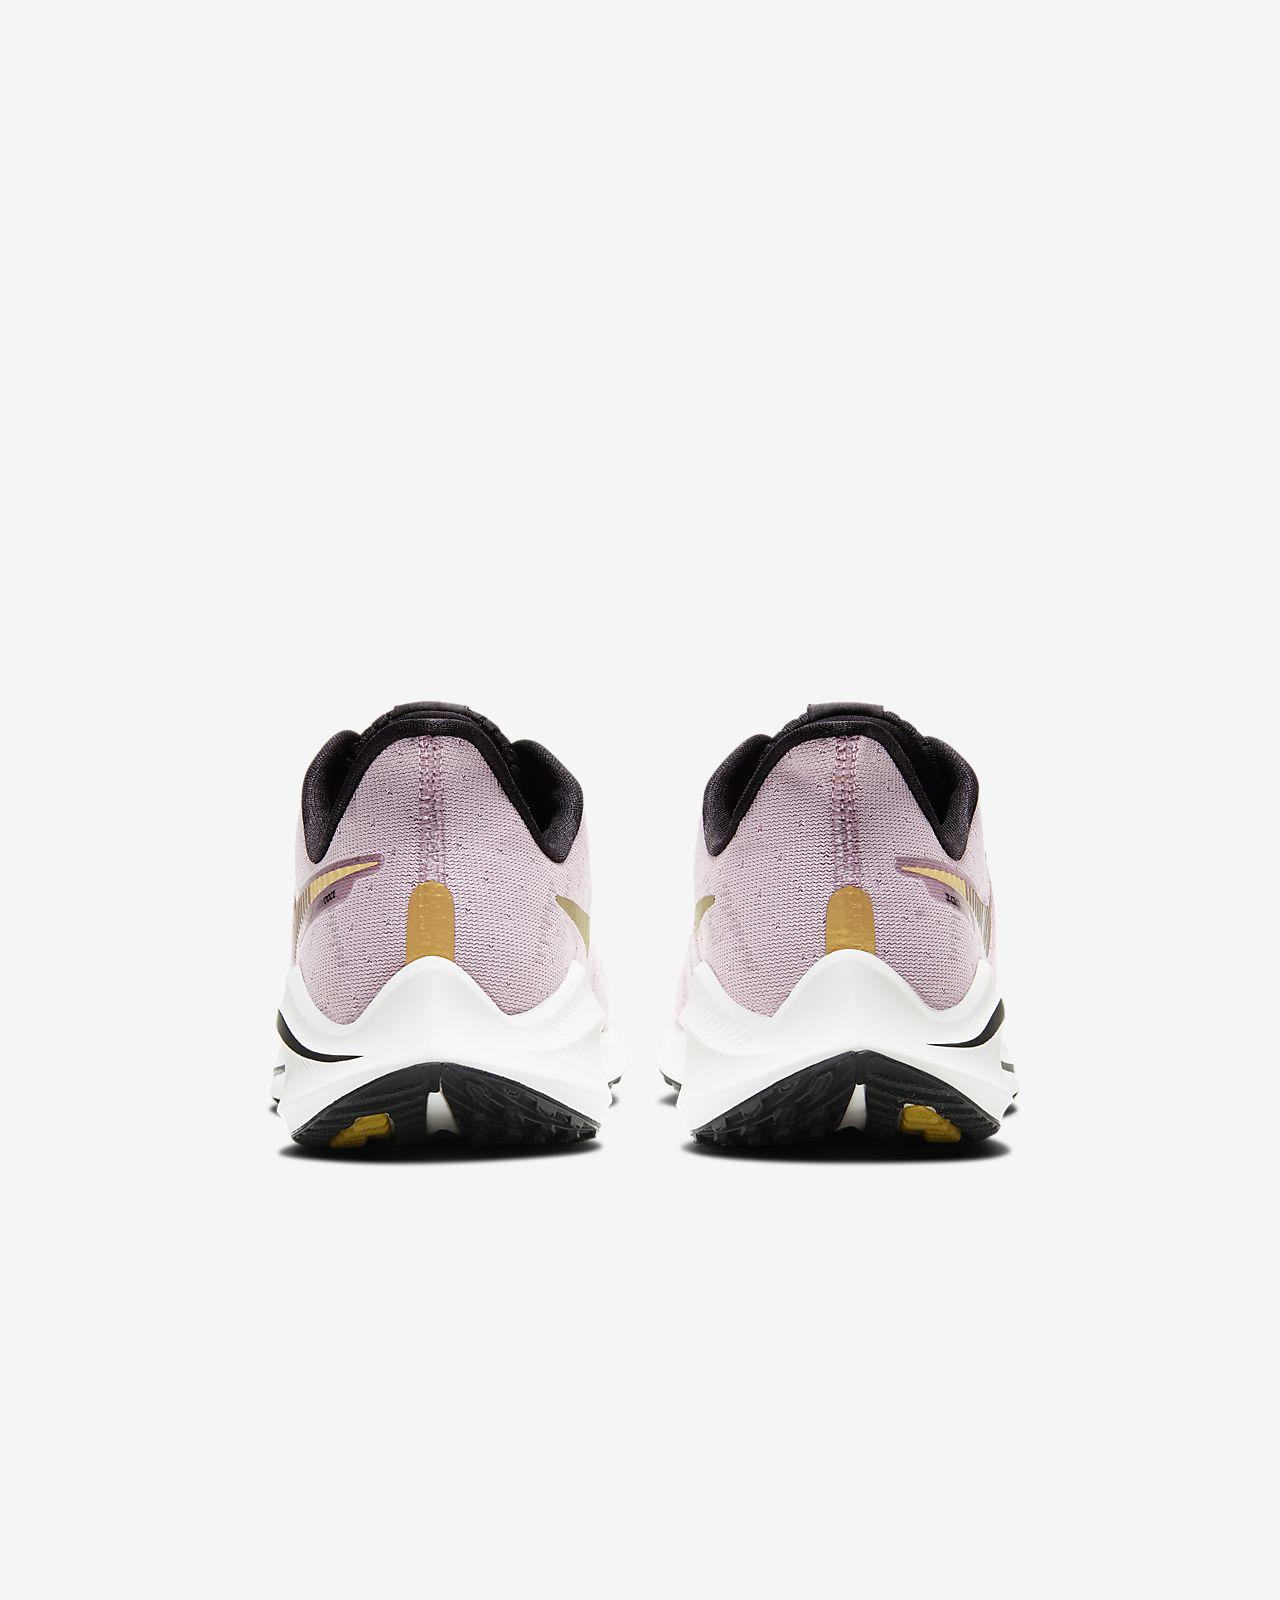 Sapatilhas de running Air Zoom Vomero 14 para mulher